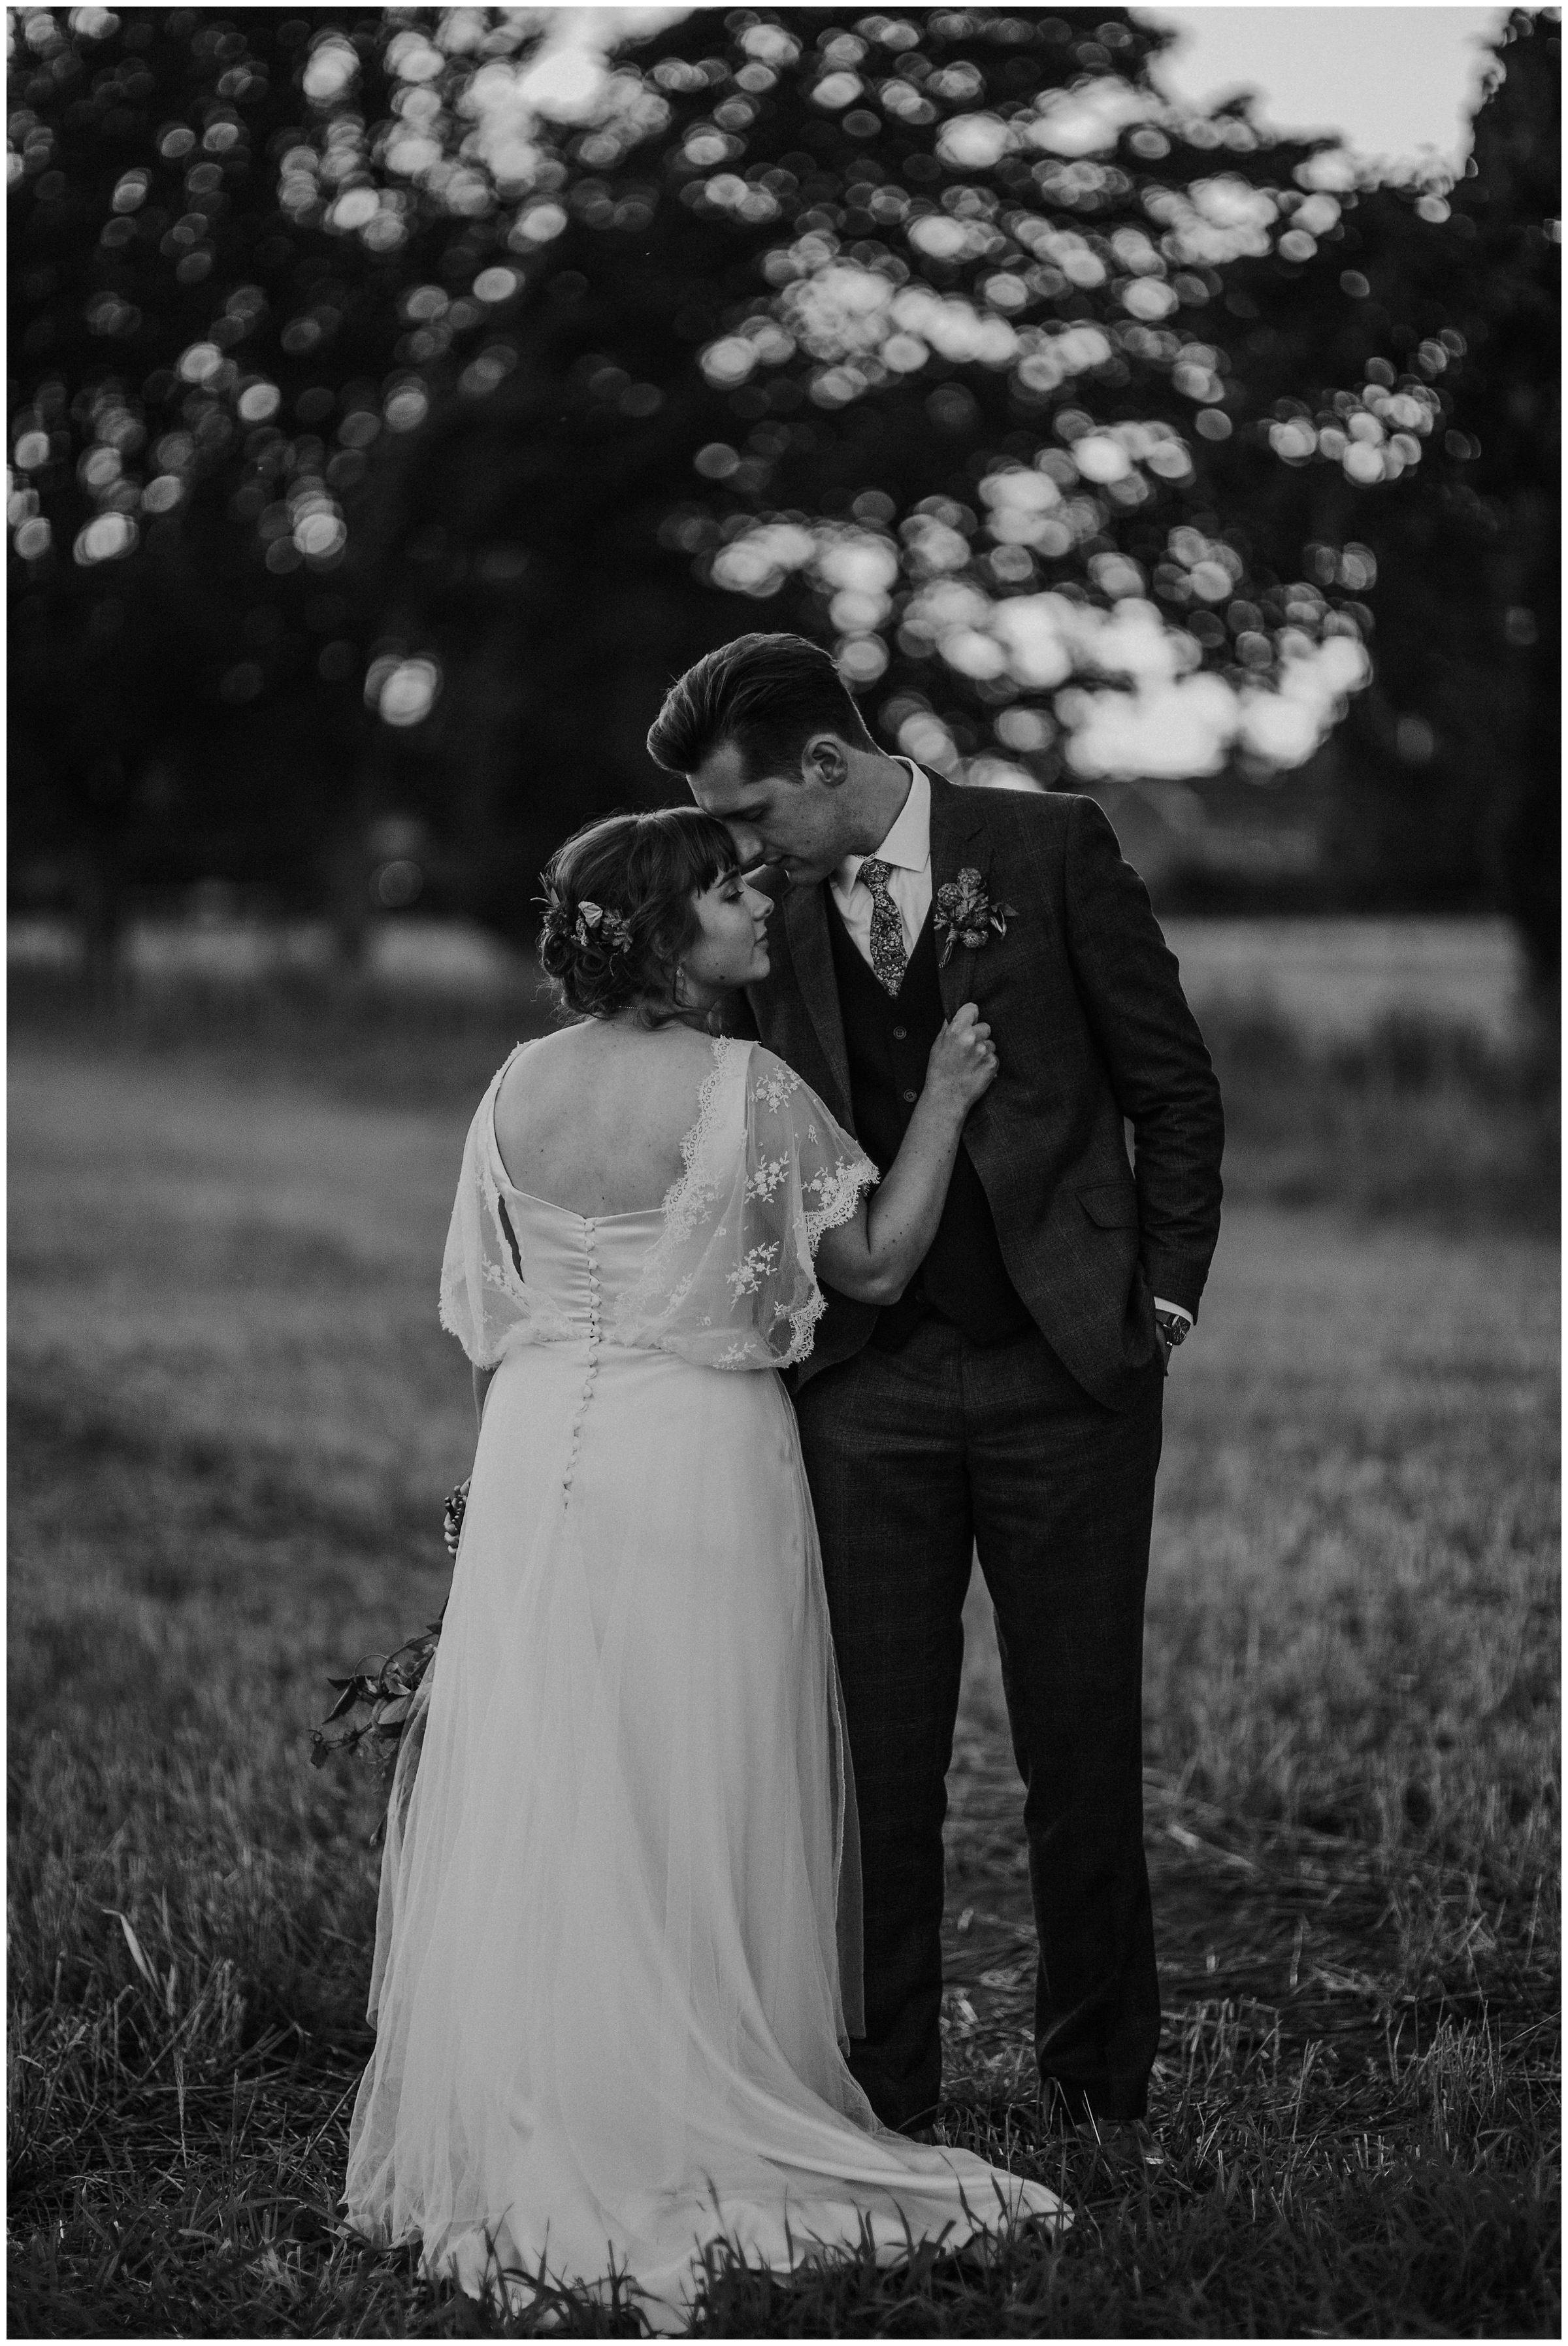 romantic photo of couple at wedding york england